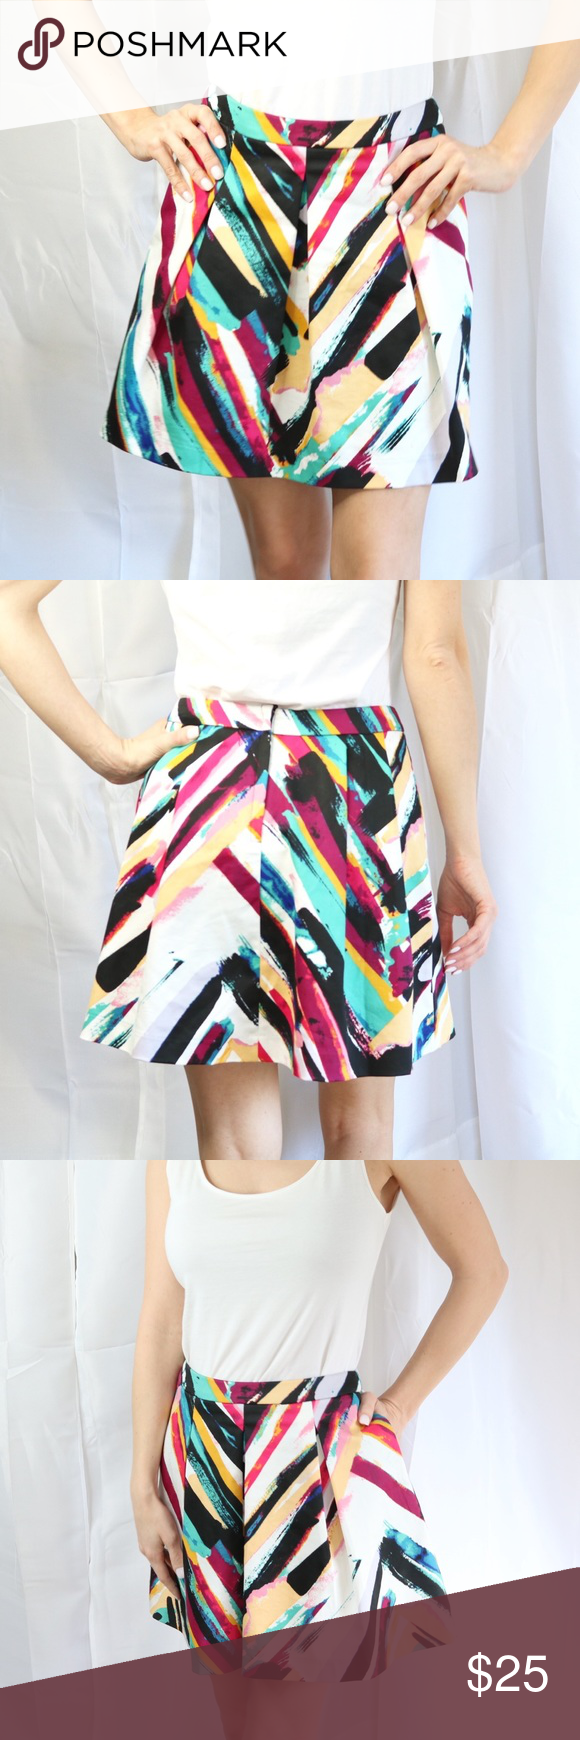 H&m pink pleated dress  HuM Pleated Multicolored Skirt  NWT  My Posh Picks  Pinterest